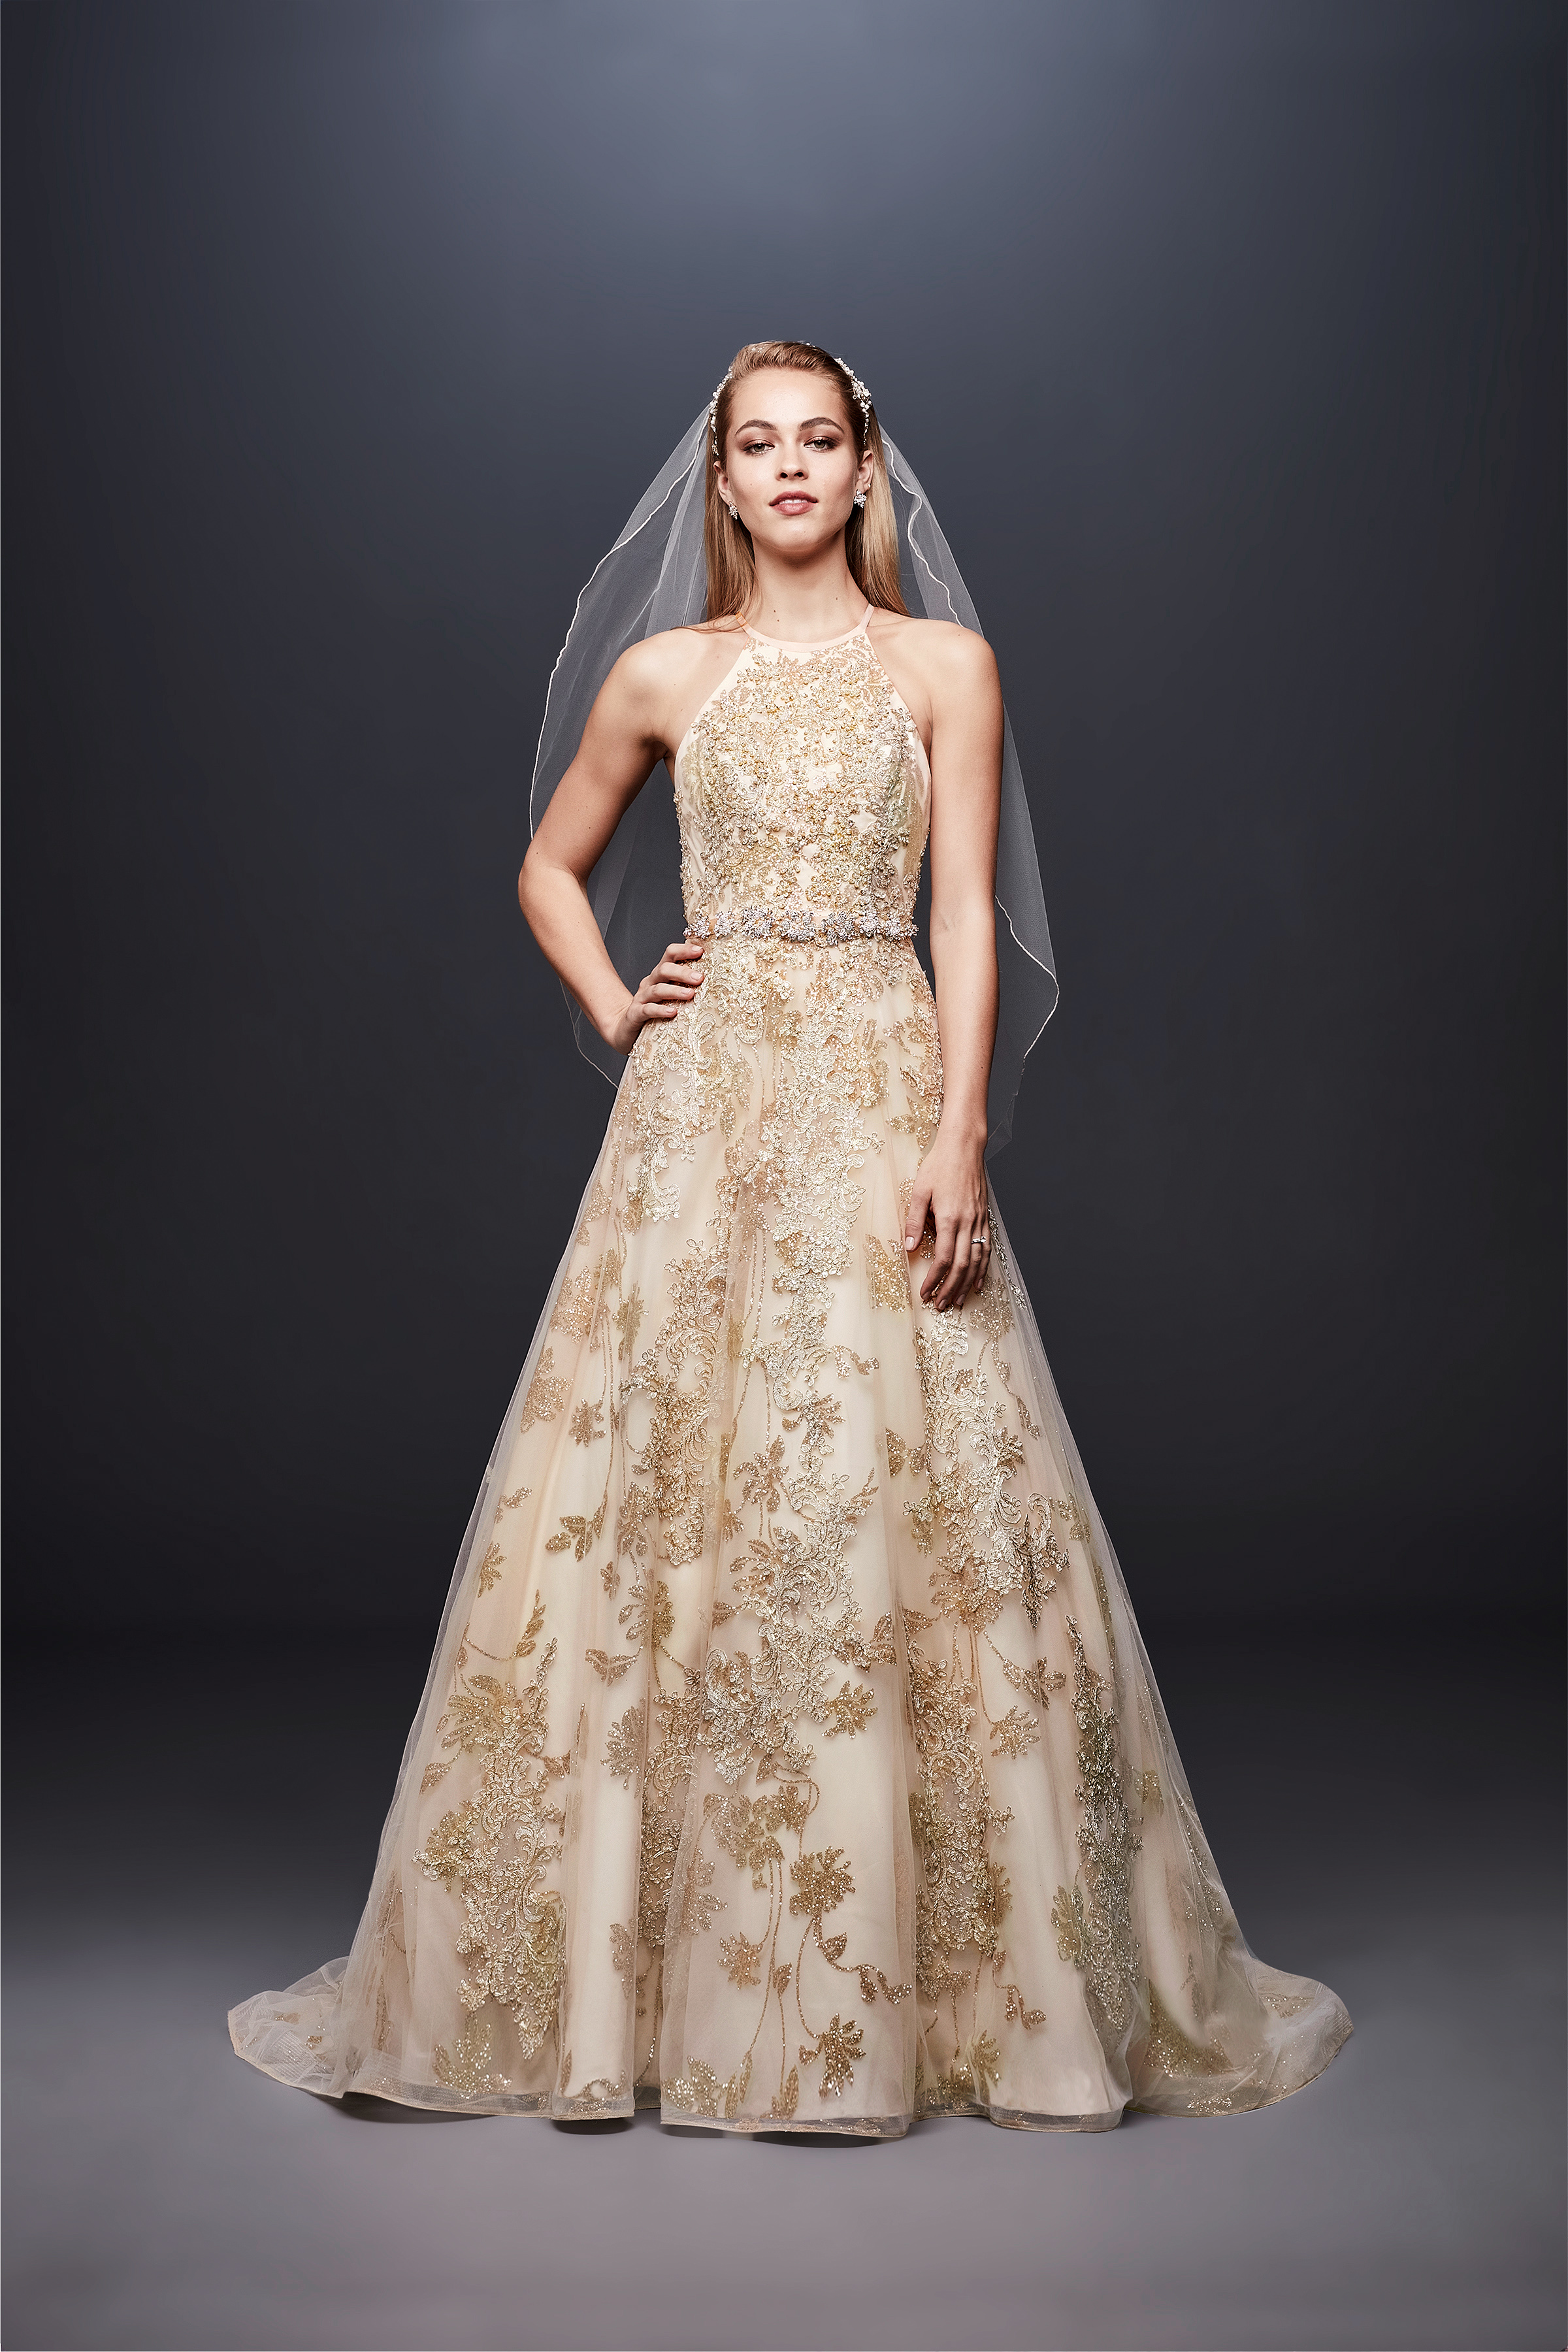 david bridal wedding dress spring 2019 gold halter patterned